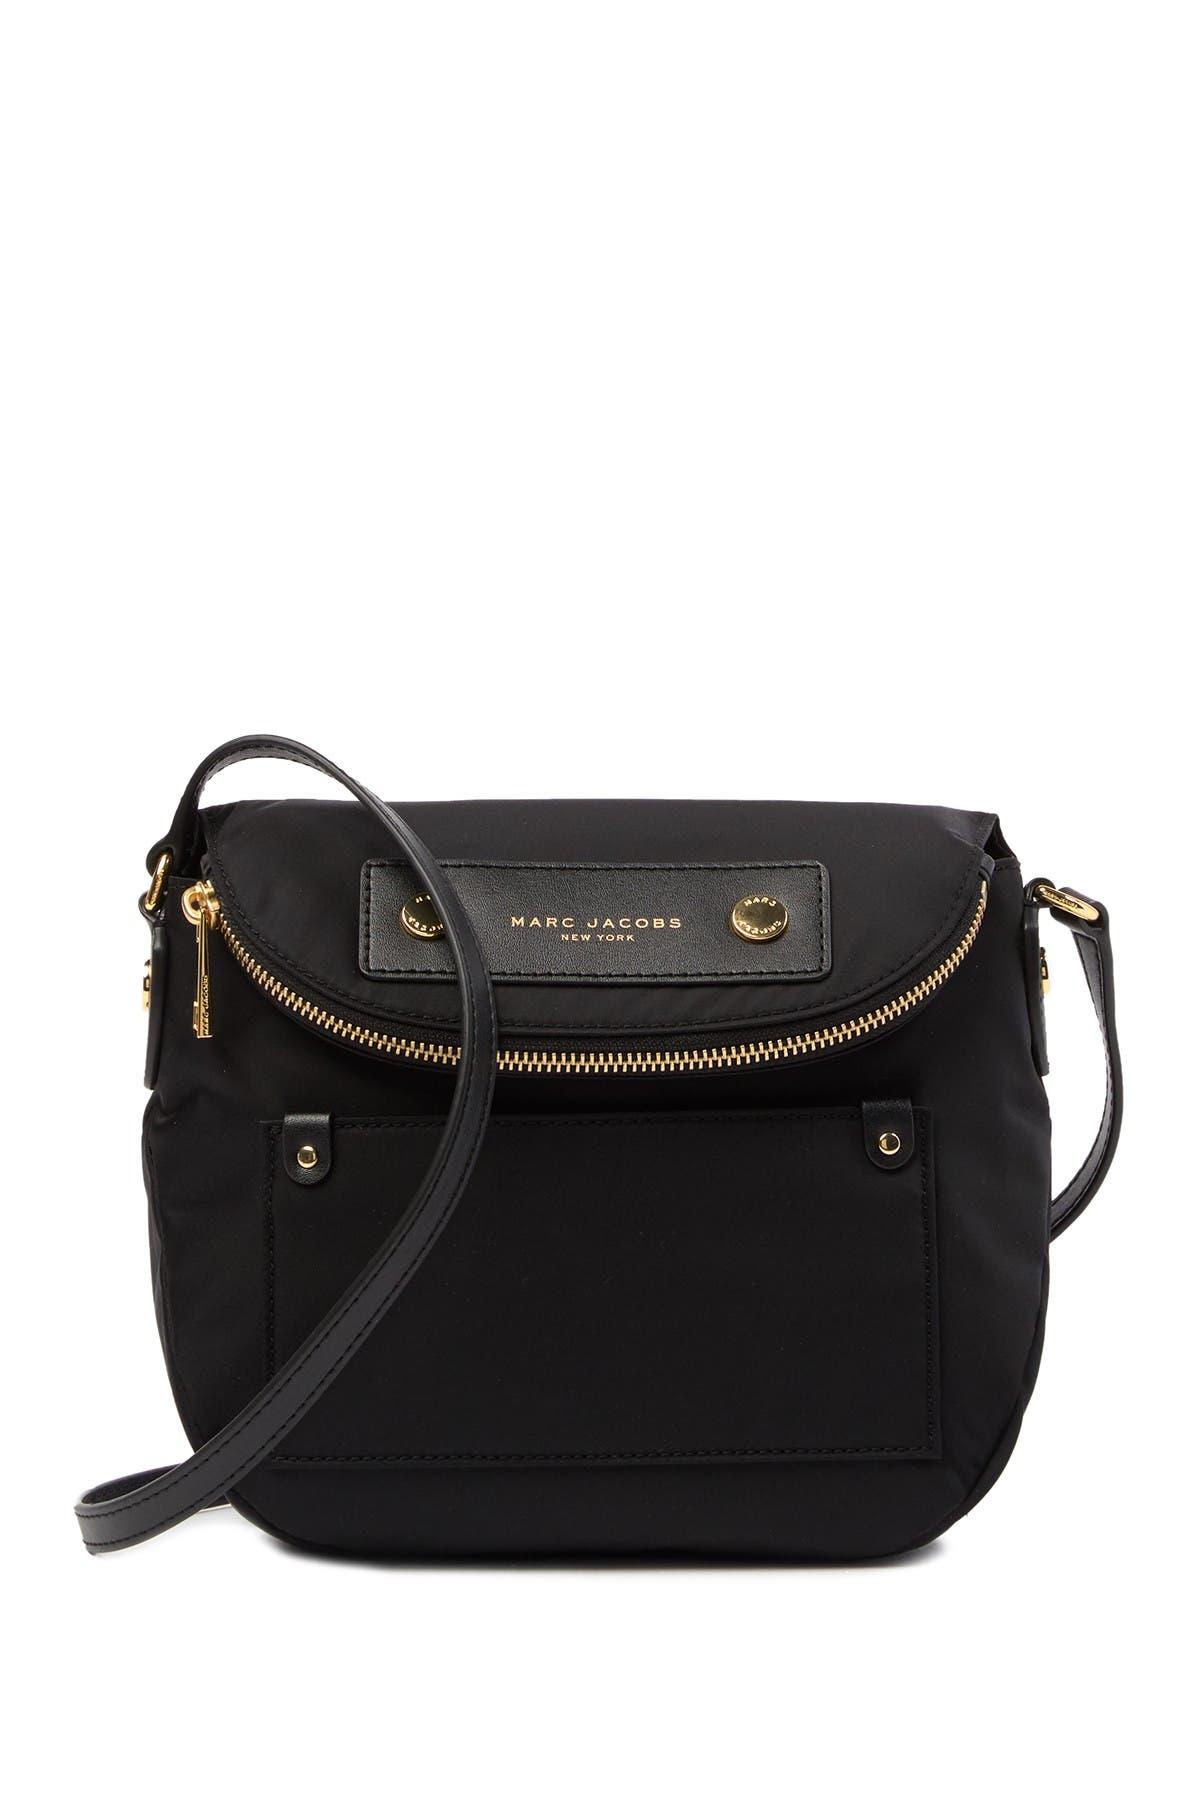 Image of Marc Jacobs Preppy Nylon Mini Natasha Crossbody Bag